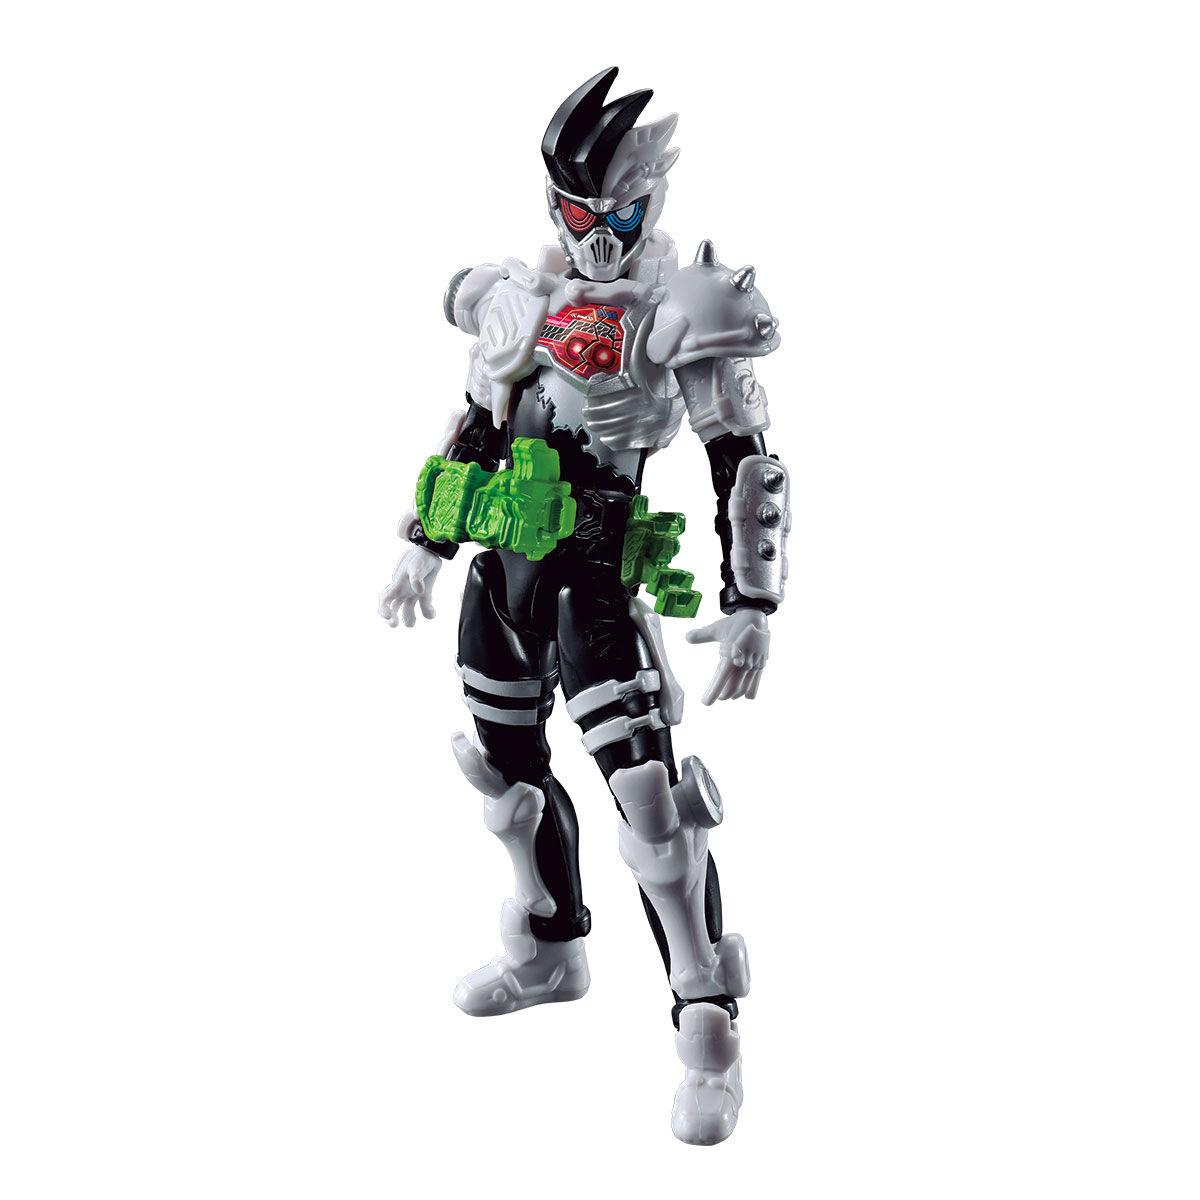 RKF レジェンドライダーシリーズ 仮面ライダーゲンム ゾンビアクションゲーマー